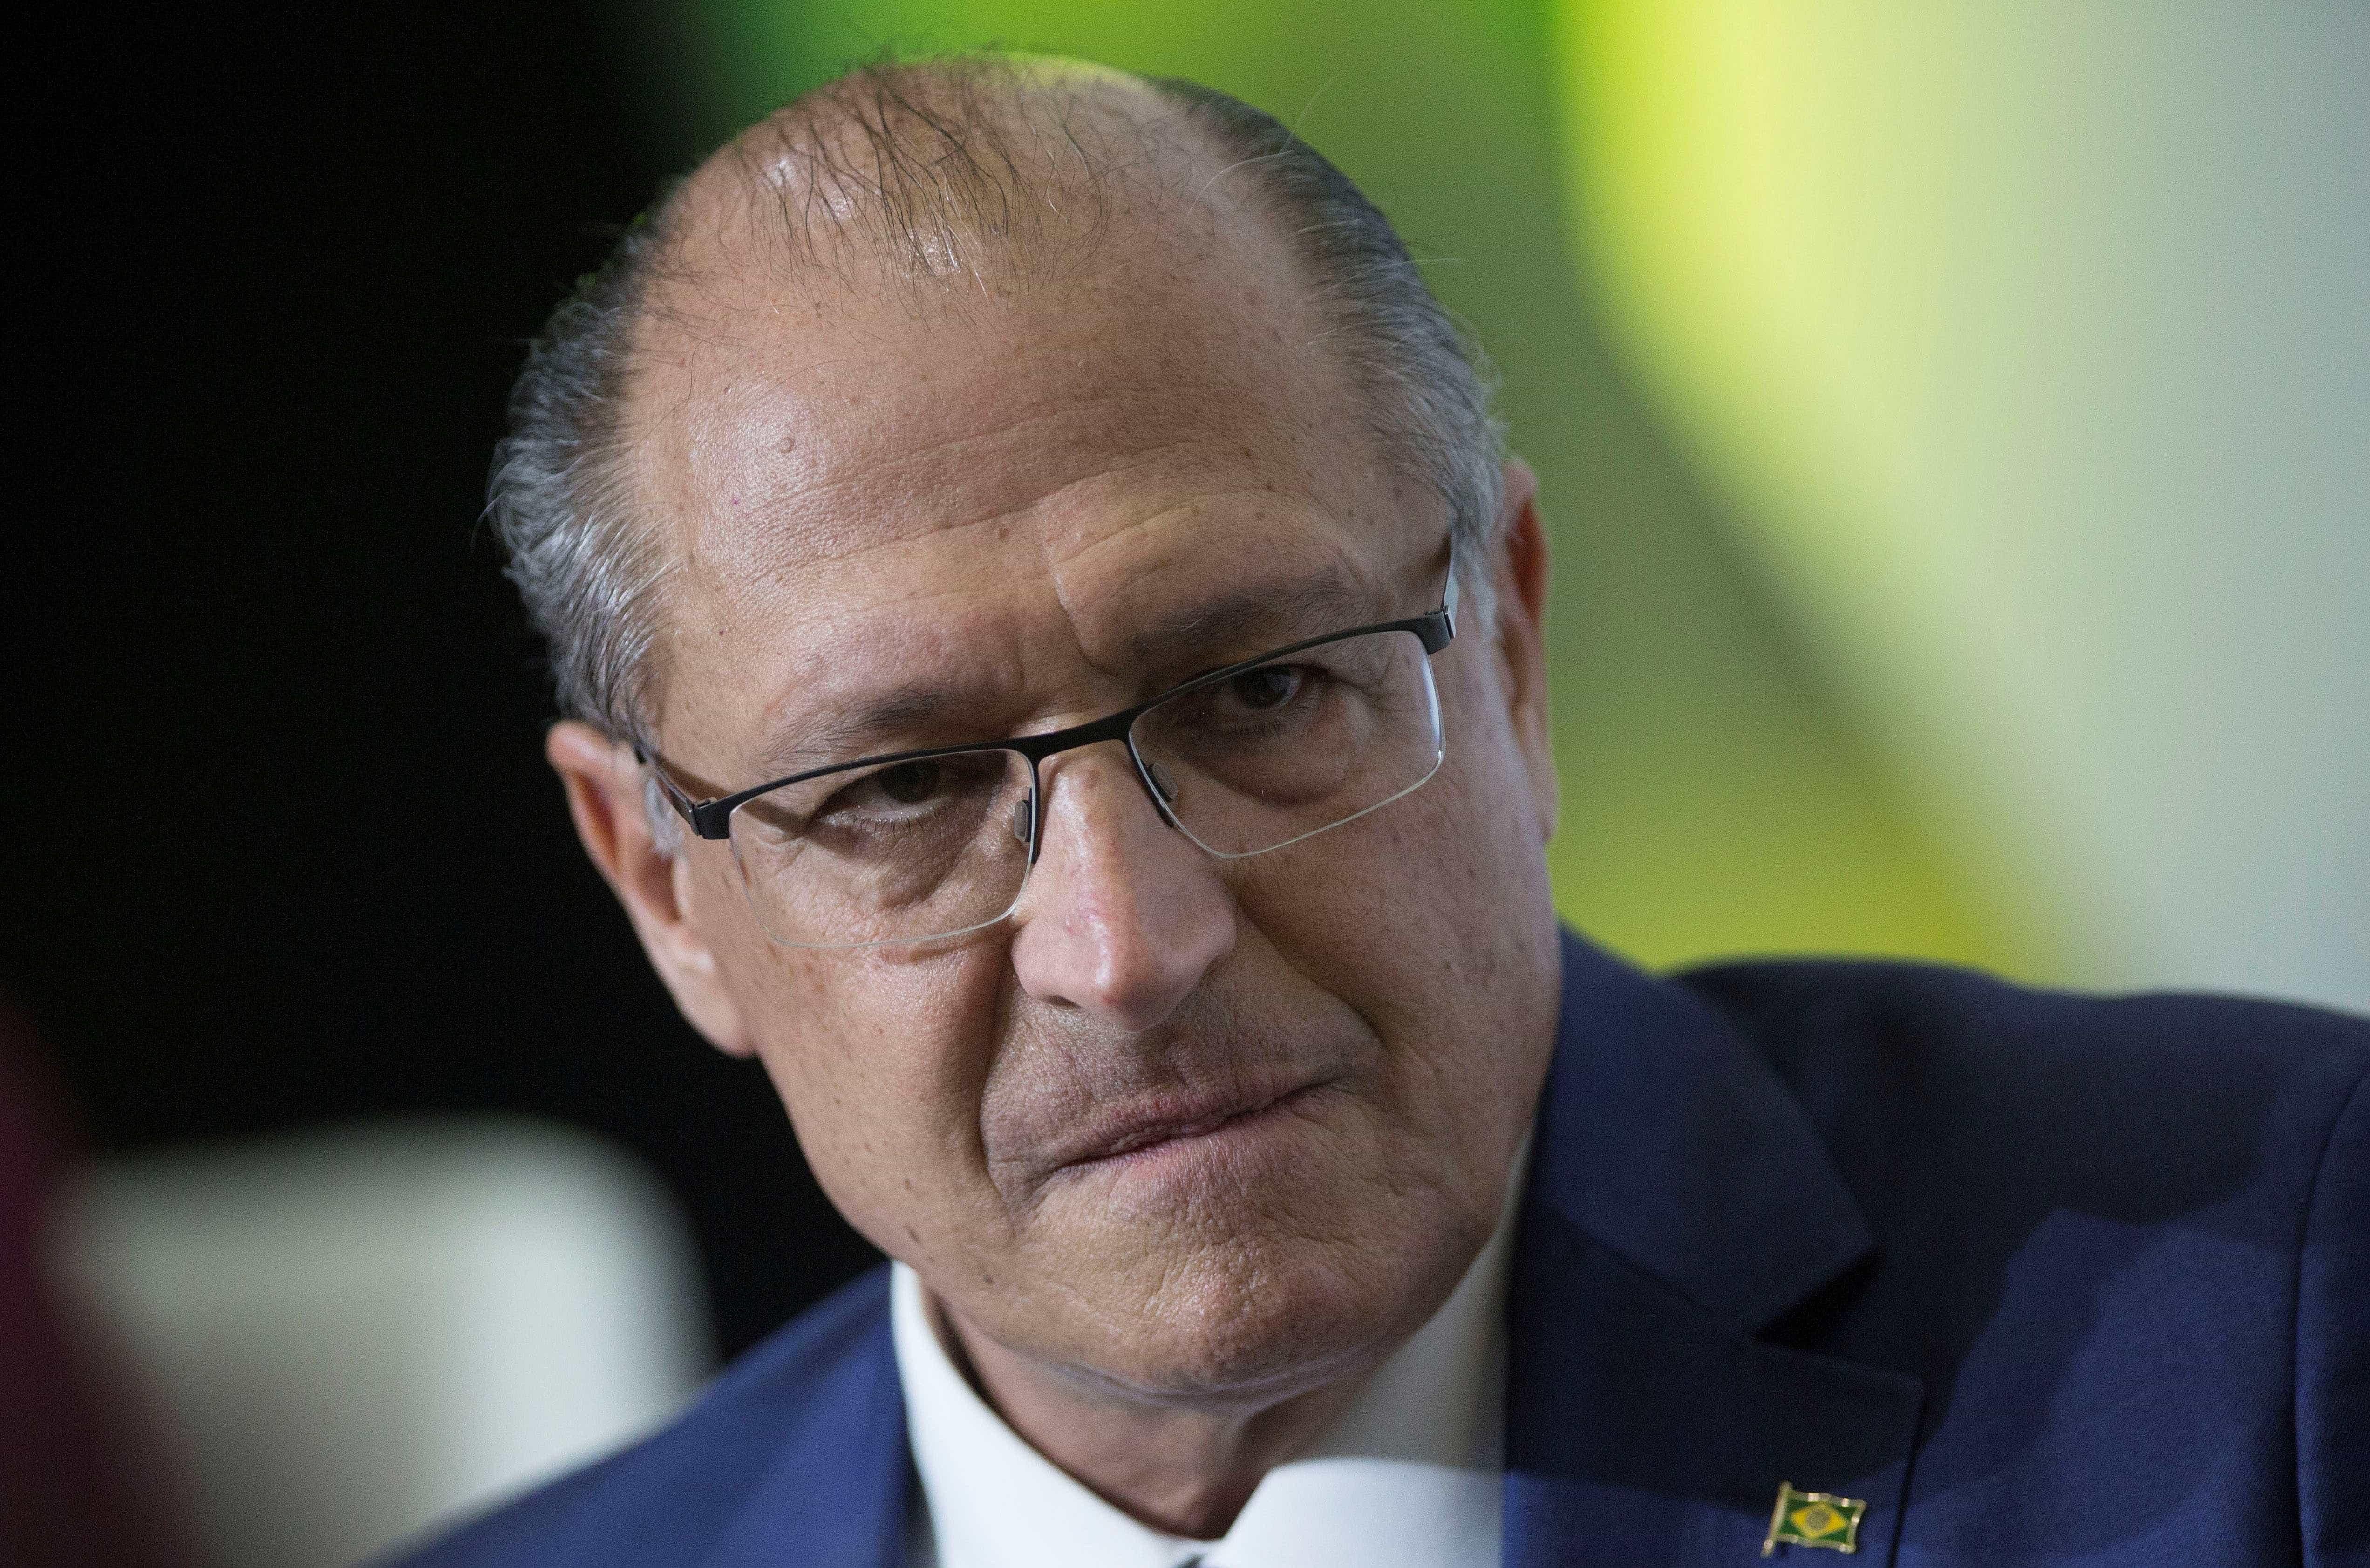 Alckmin divulga programa de governo enxuto e genérico de 15 páginas